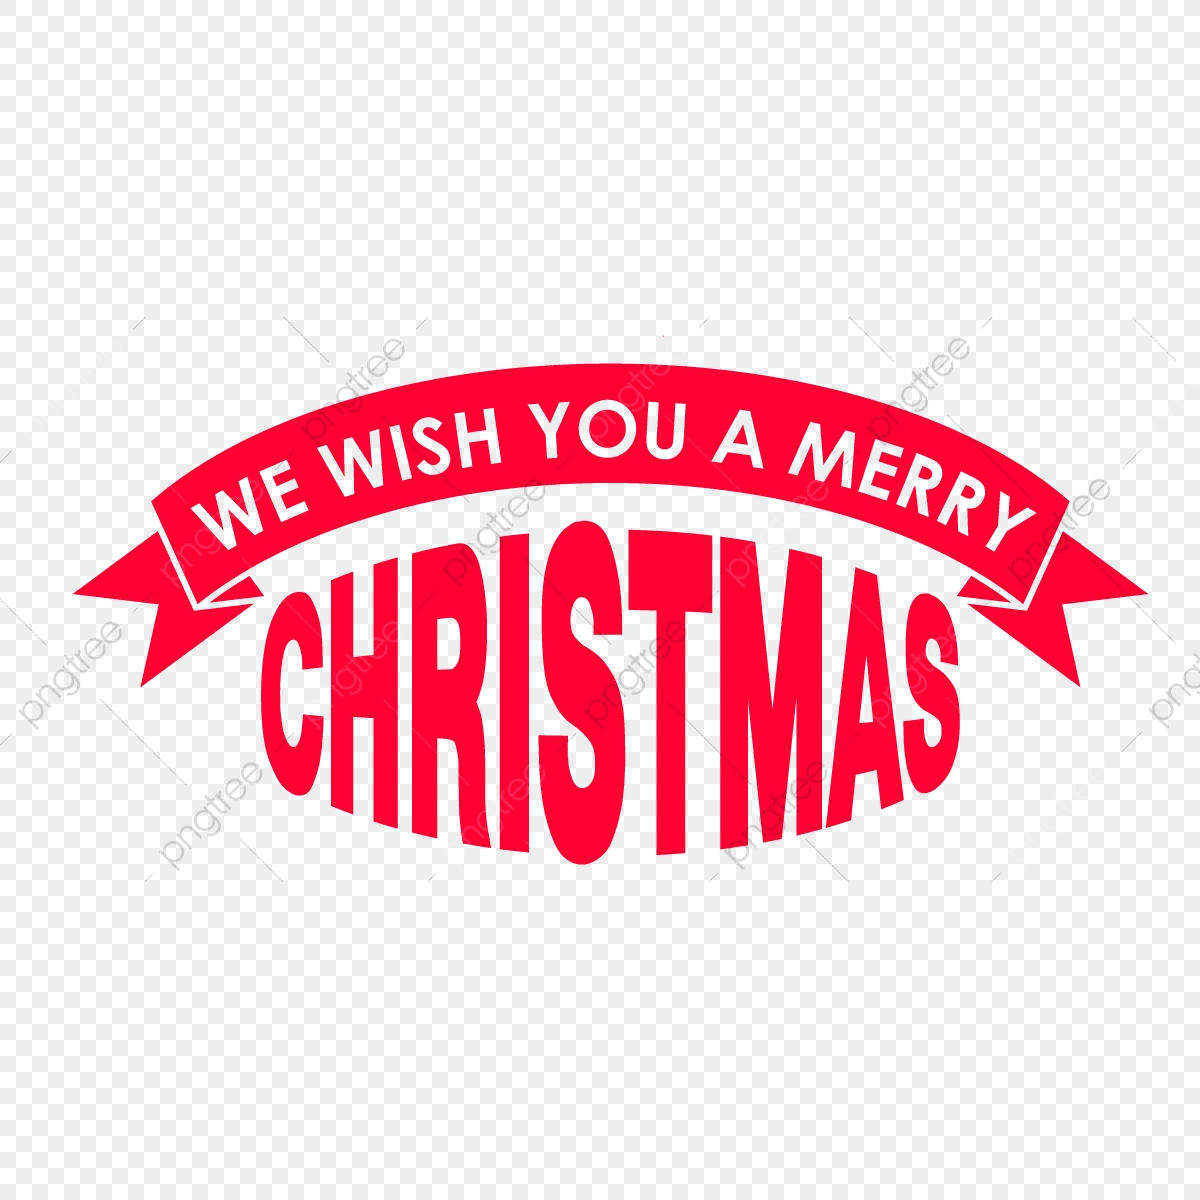 Merry Christmas Calligraphy.Merry Christmas Calligraphy Typography Pink Christmas Text